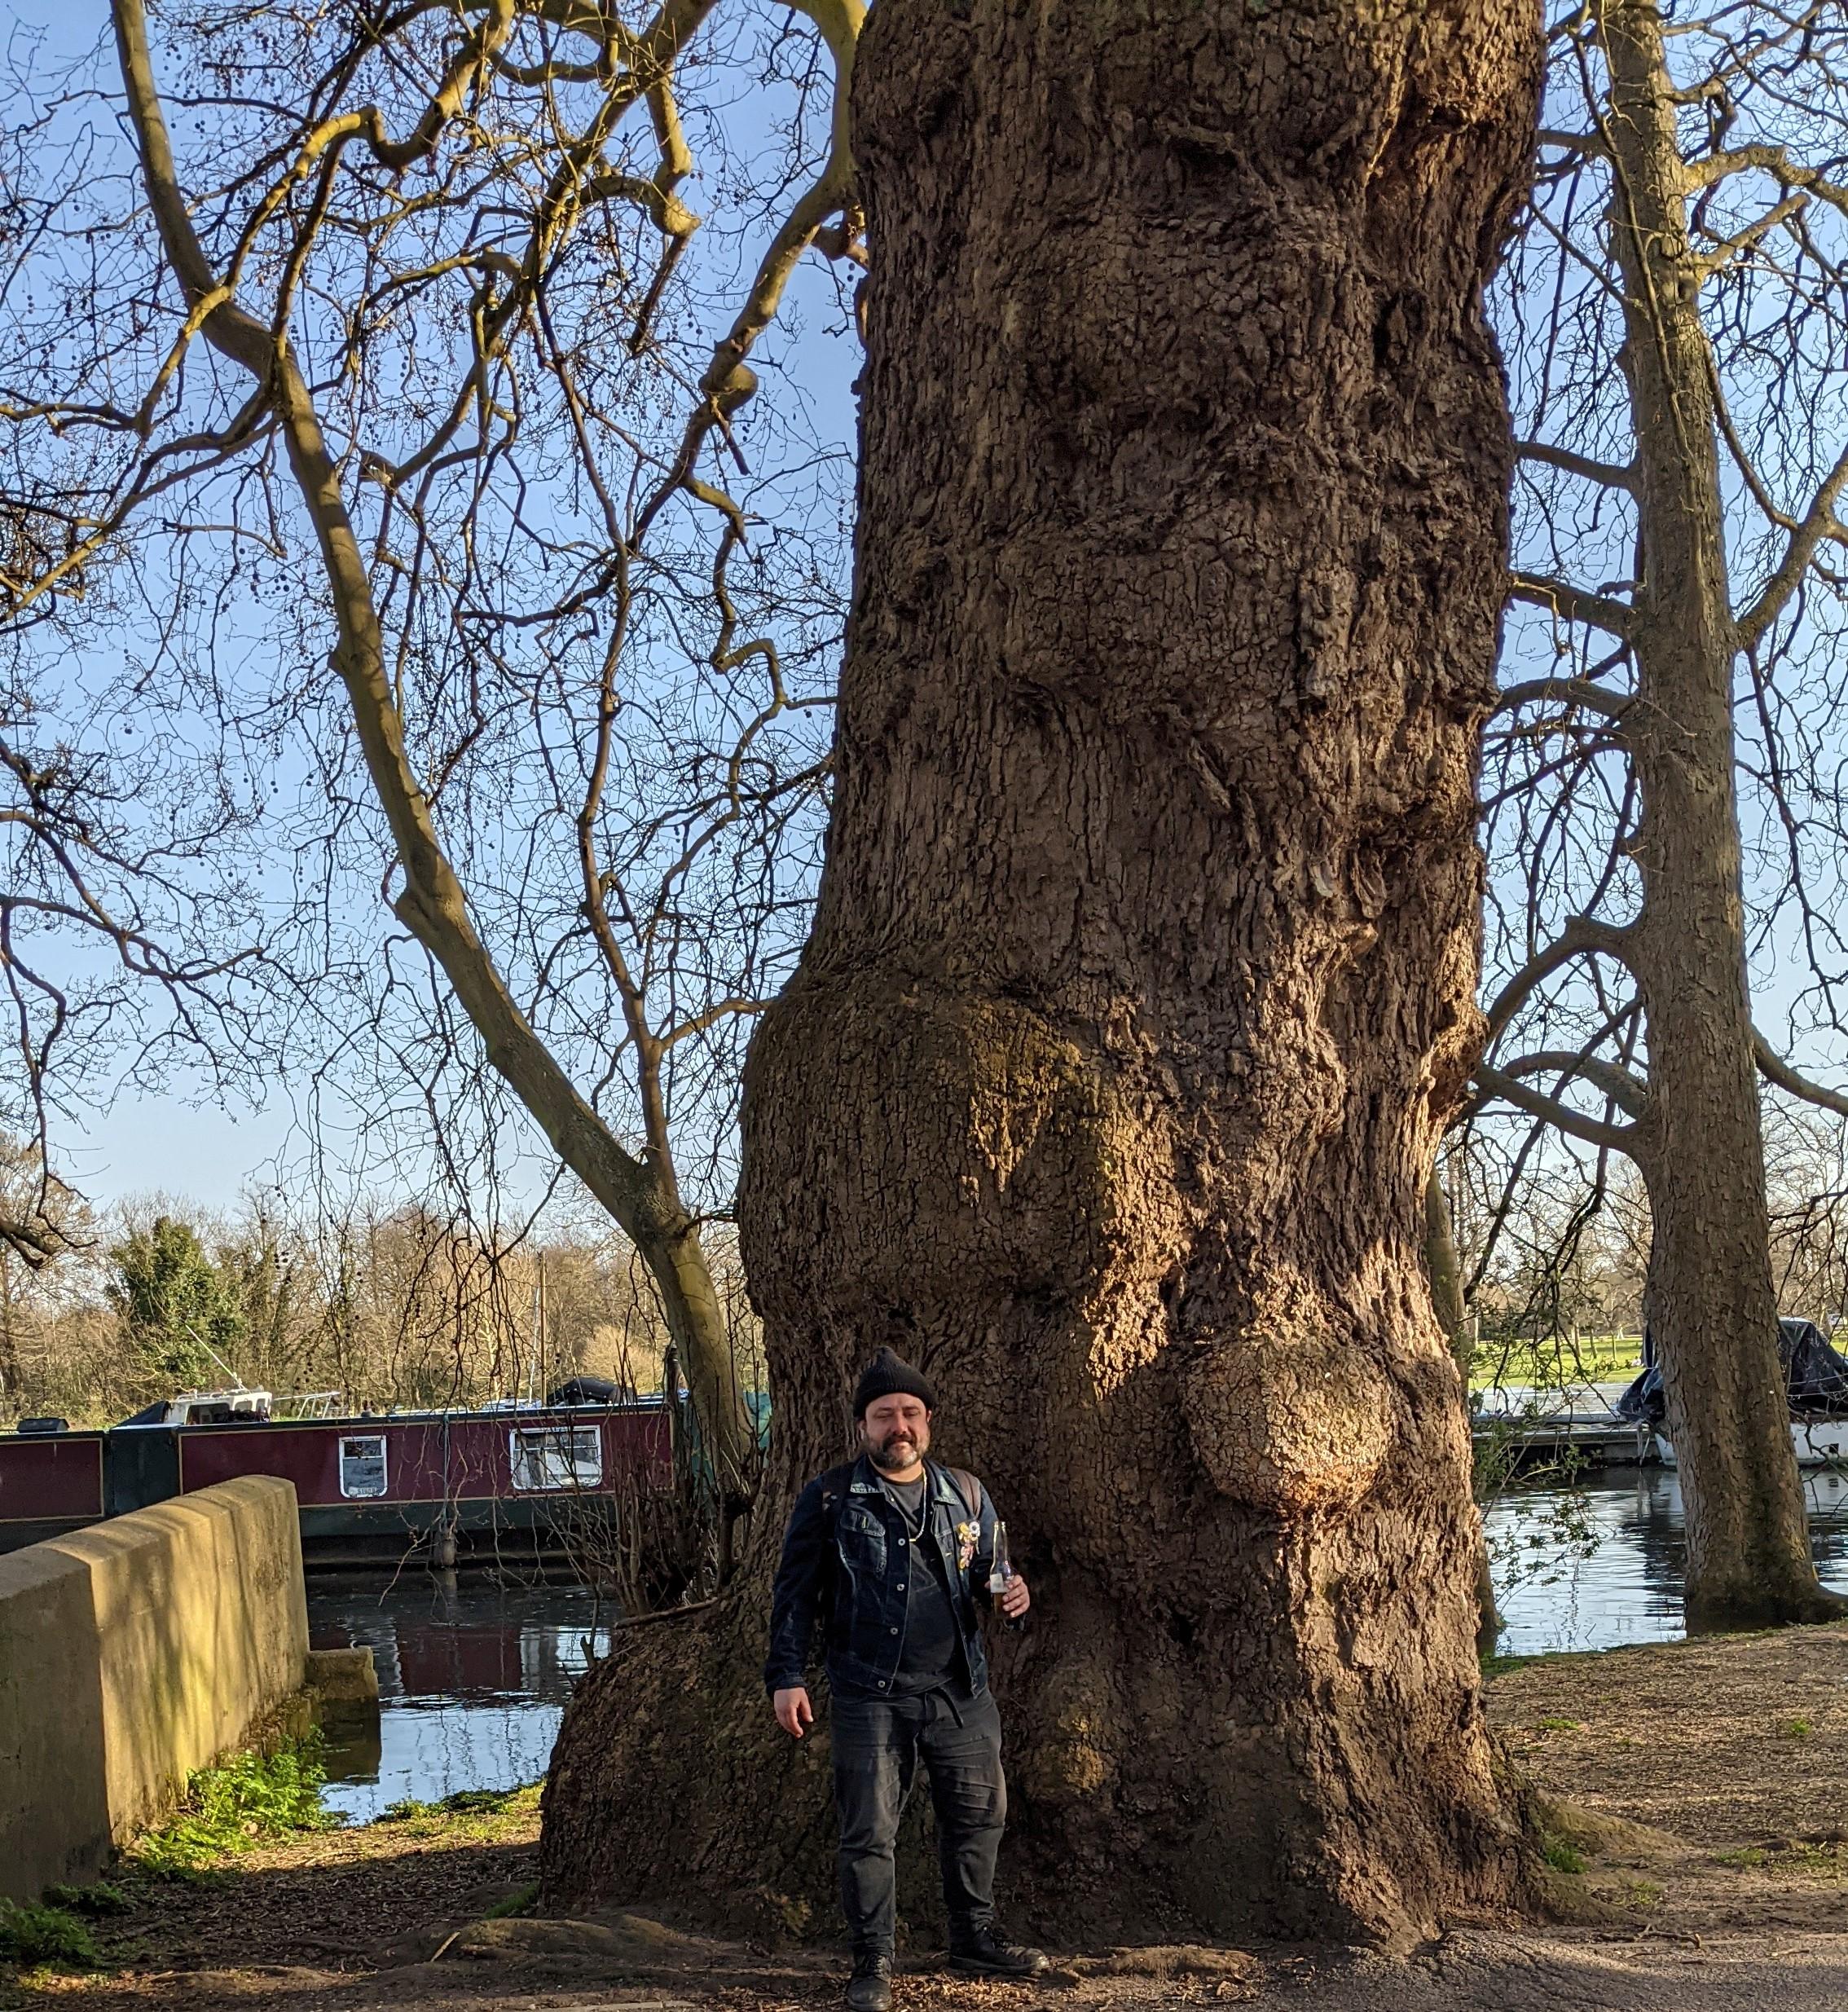 Small Eli, Big Tree